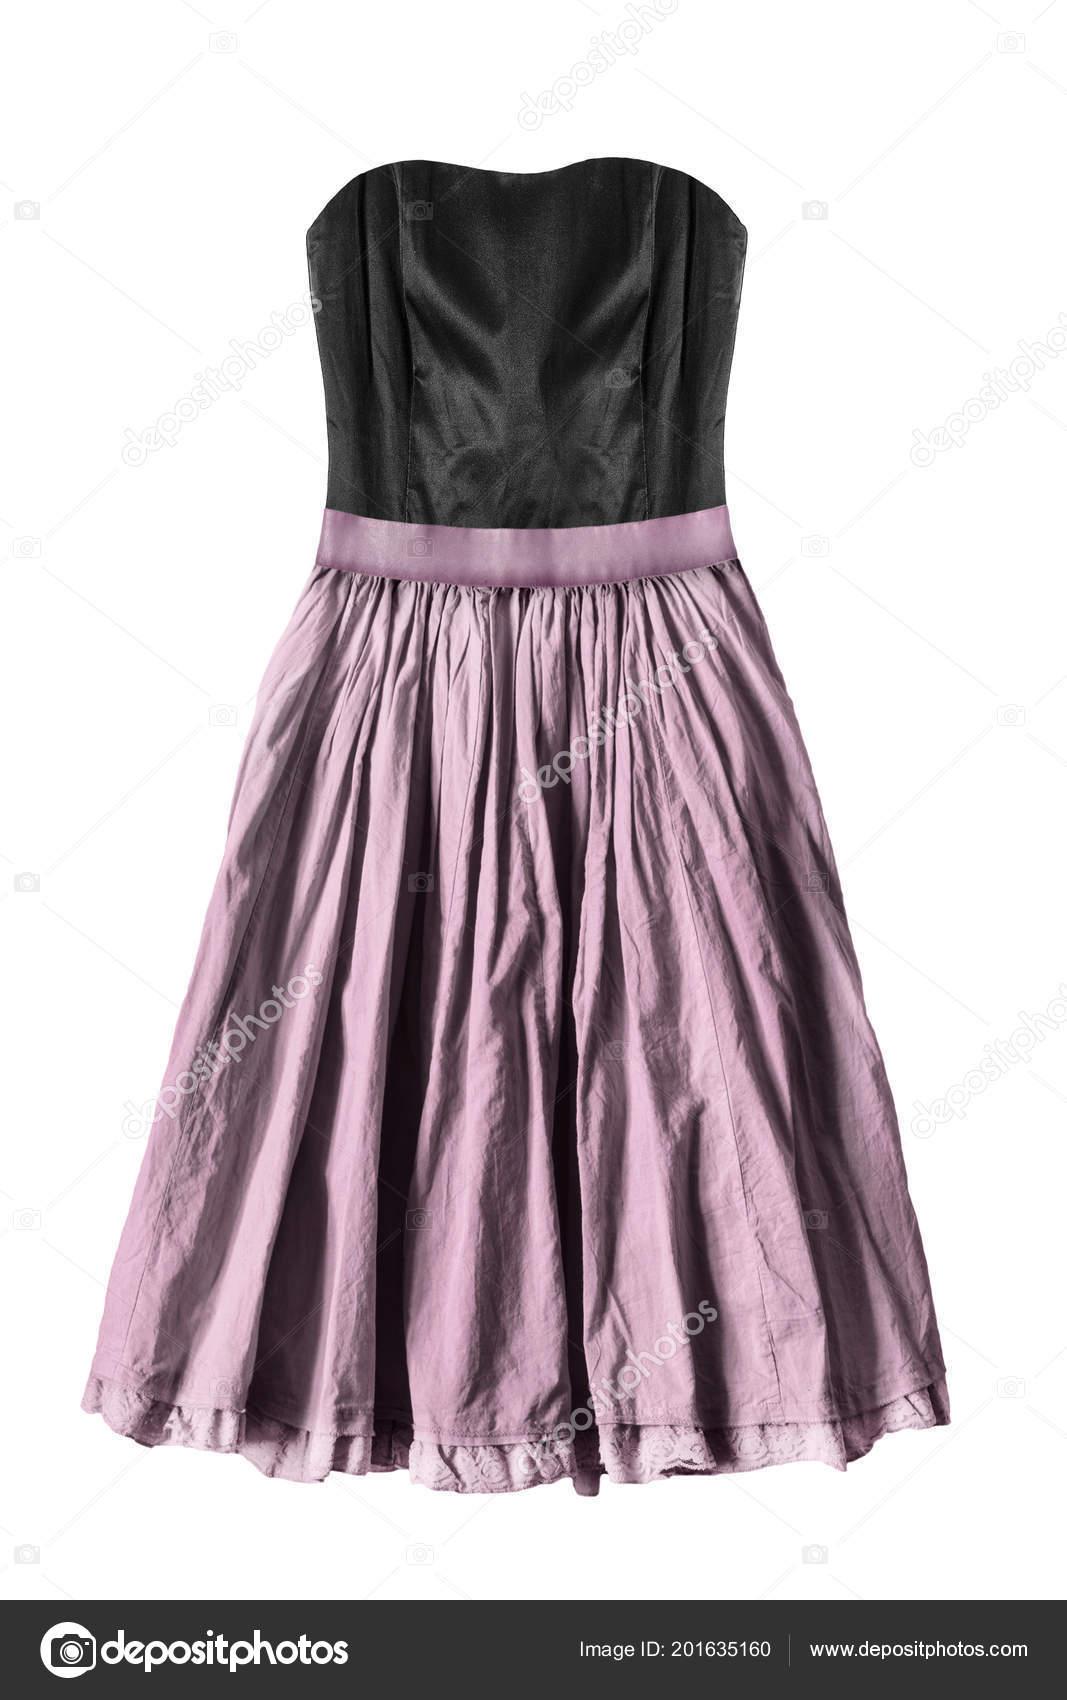 d9ff3bafc Vestido Strapless Con Corset Seda Negro Falda Acampanada Color Rosa ...